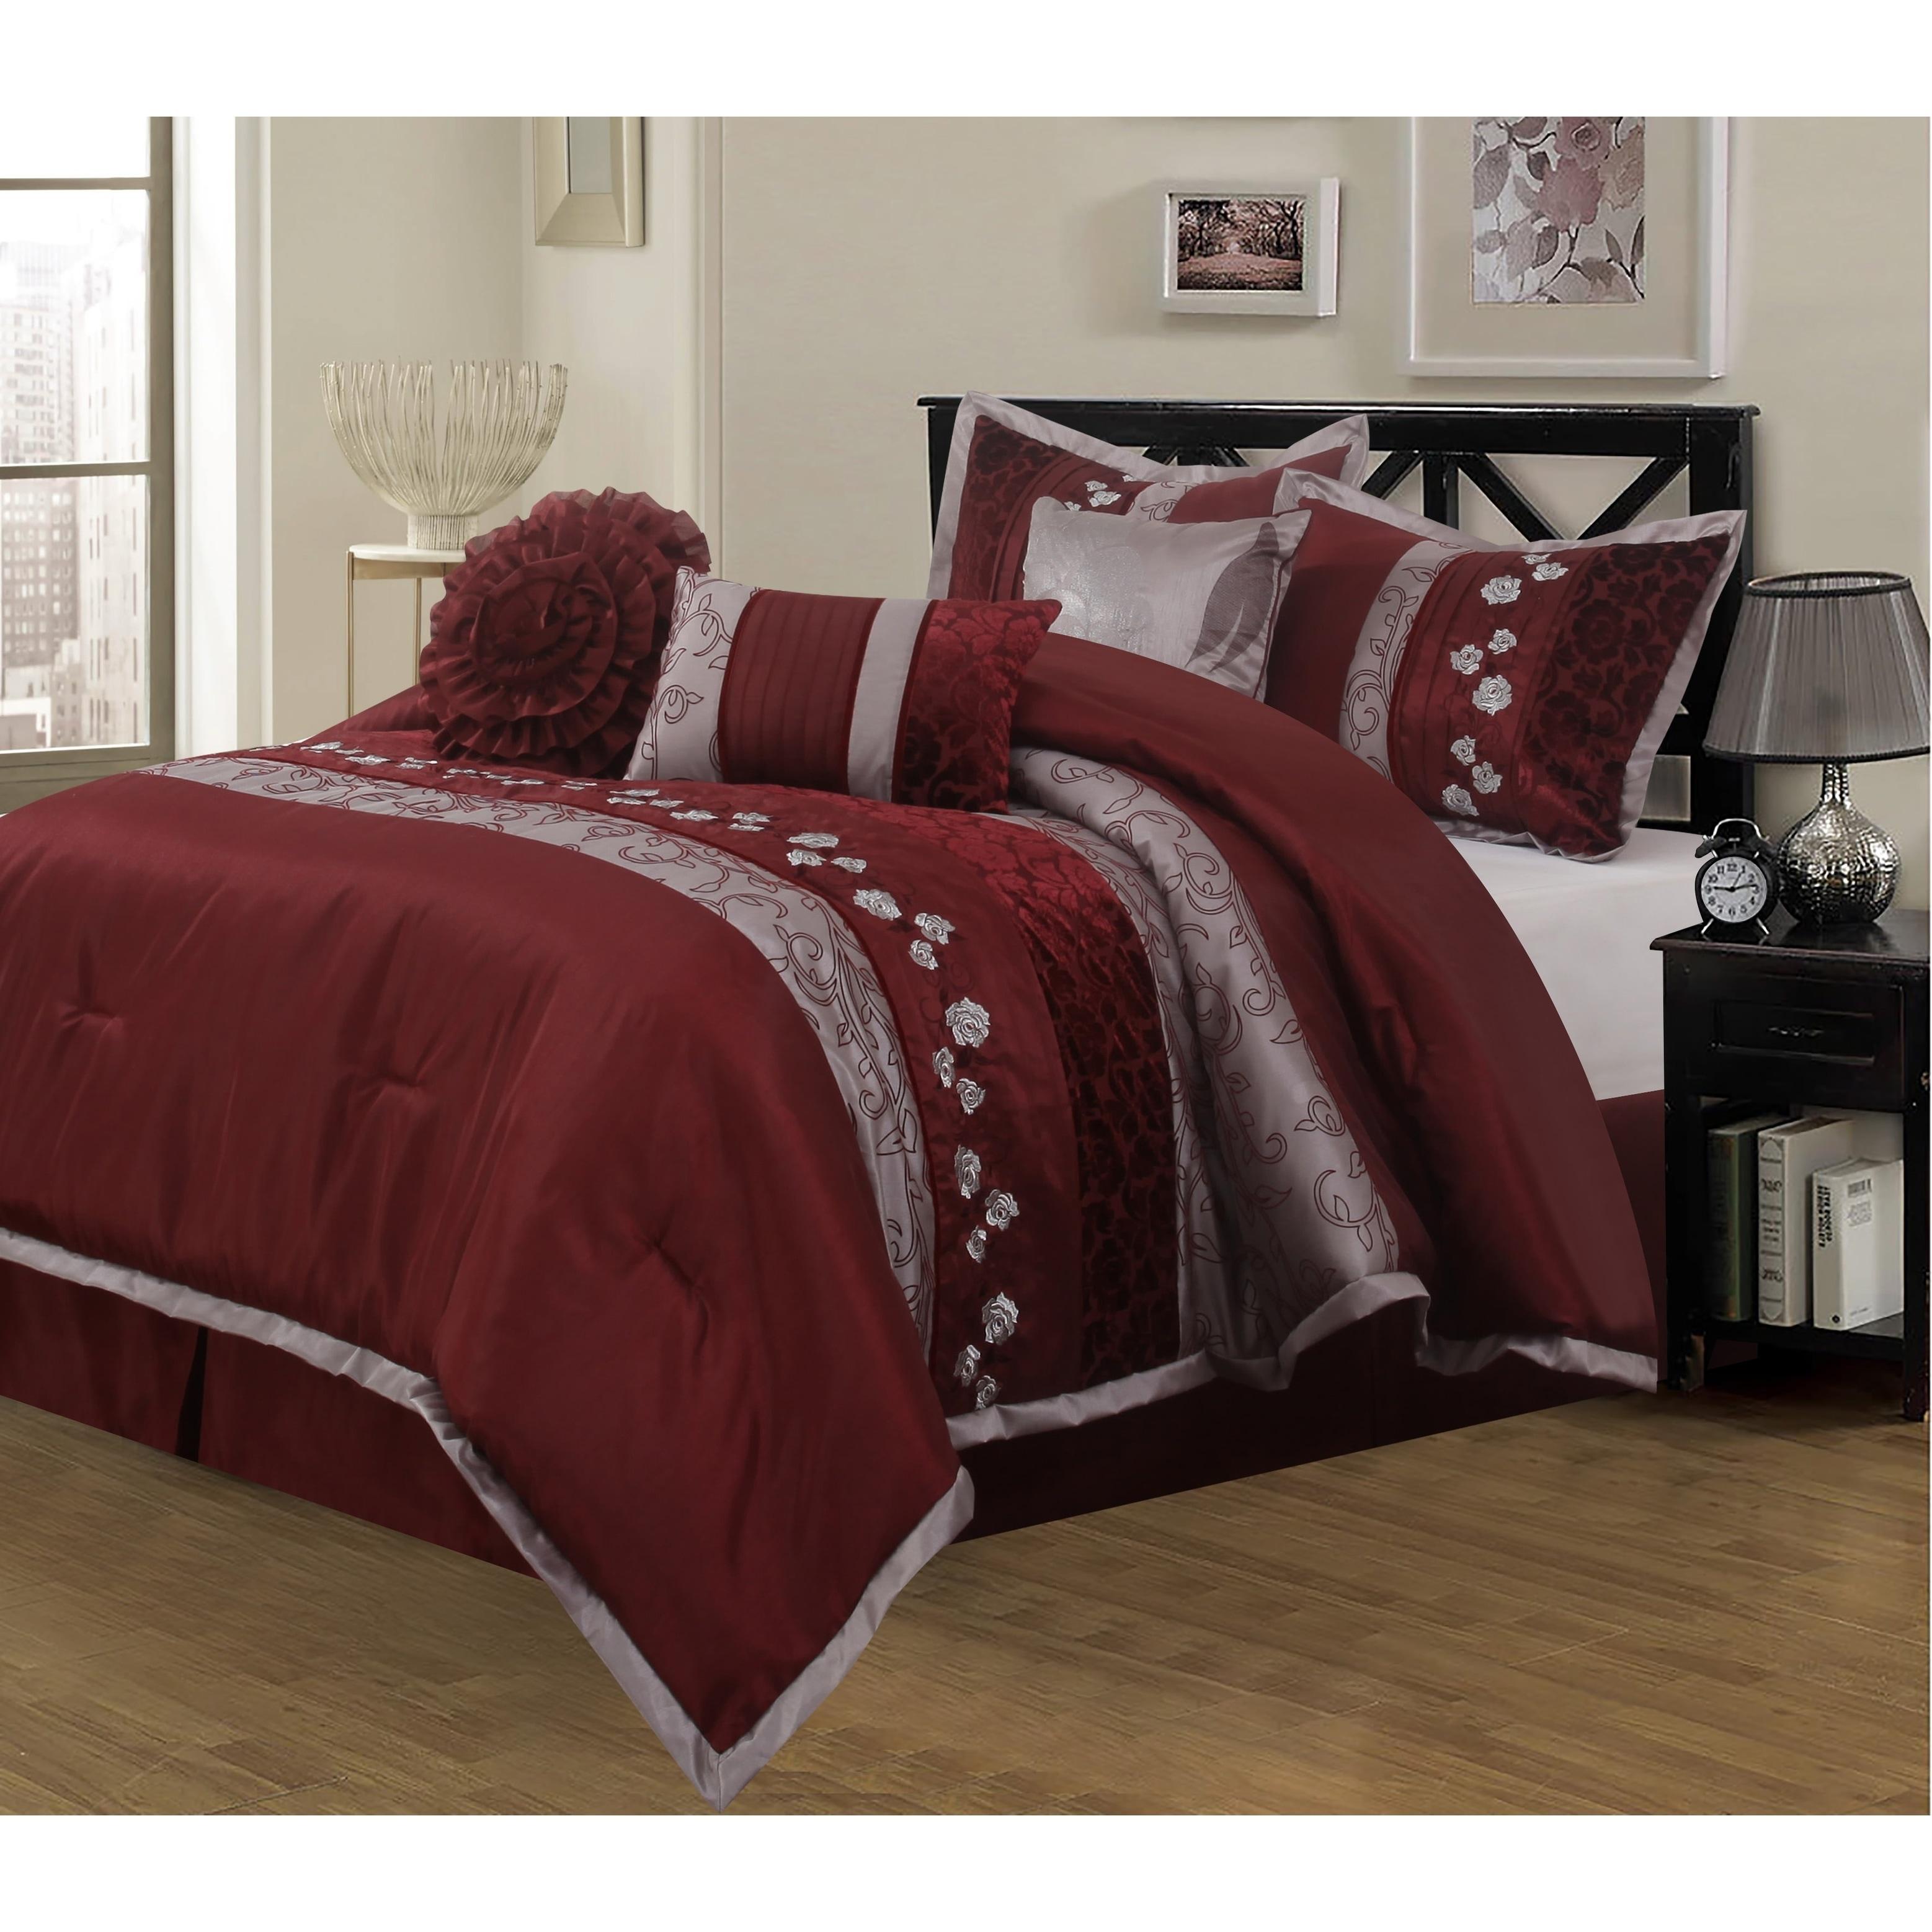 Nanshing Riley Wine 7 Piece California King Size Bedding Comforter Set As Is Item Overstock 28263450